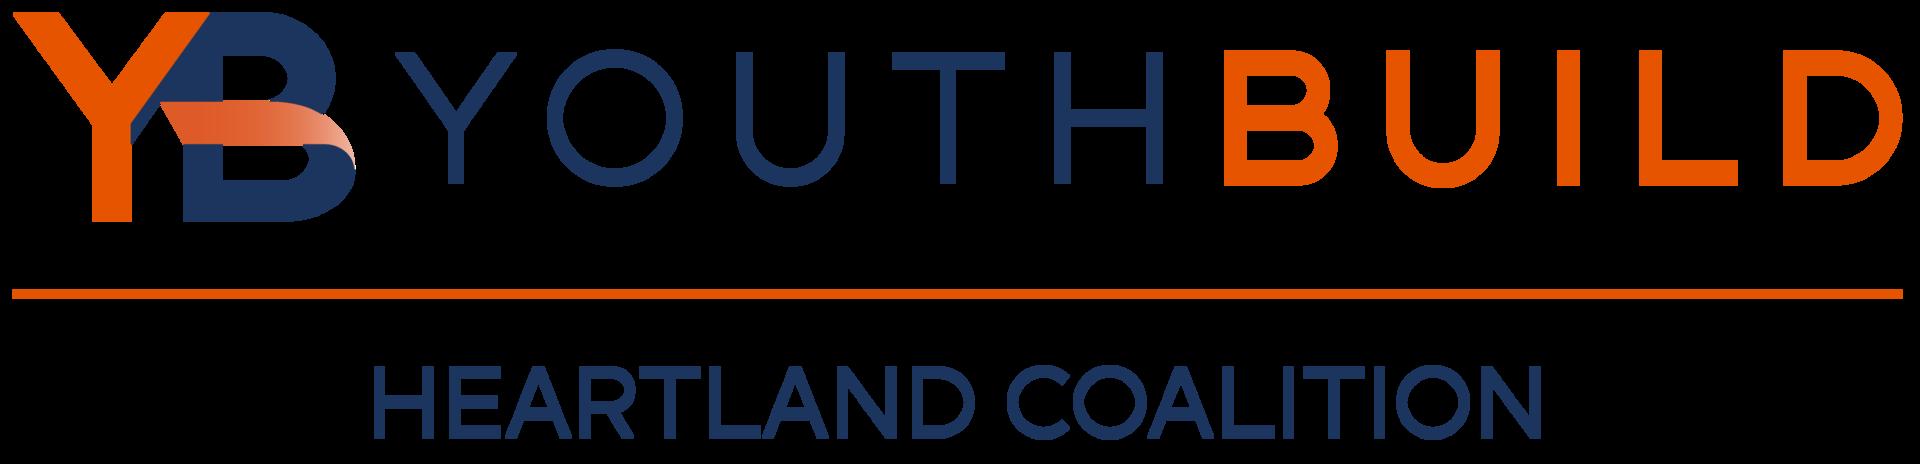 Heartland Coalition YouthBuild logo